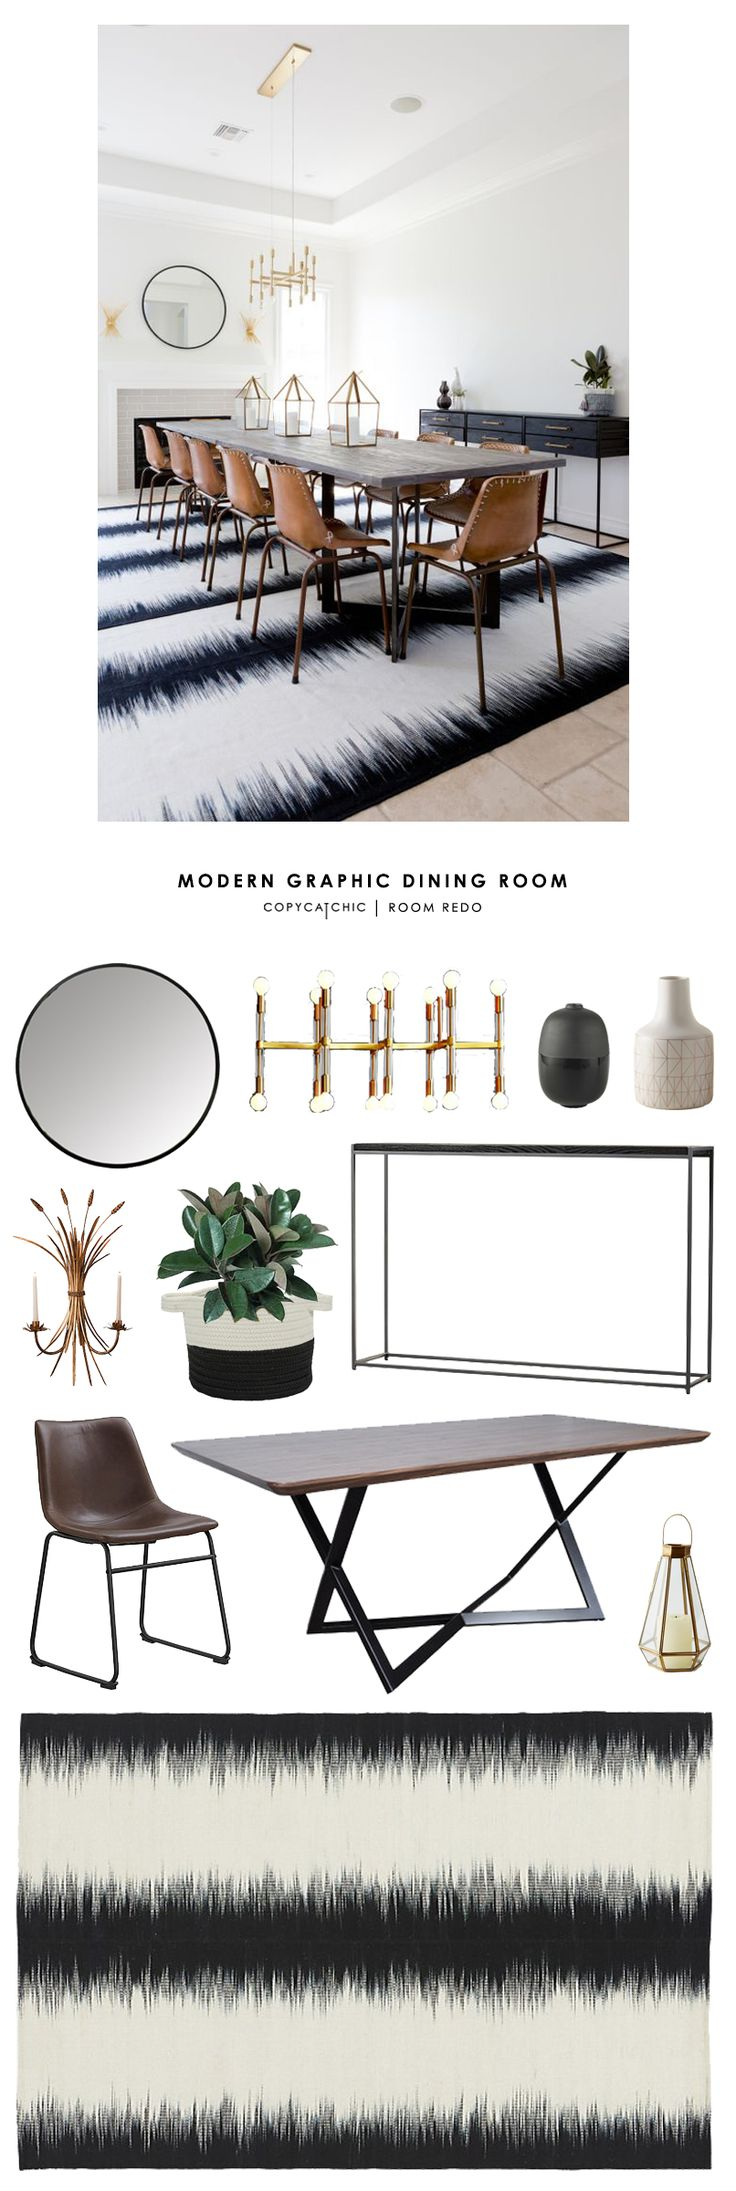 Copy Cat Chic Room Redo   Modern Graphic Dining Room